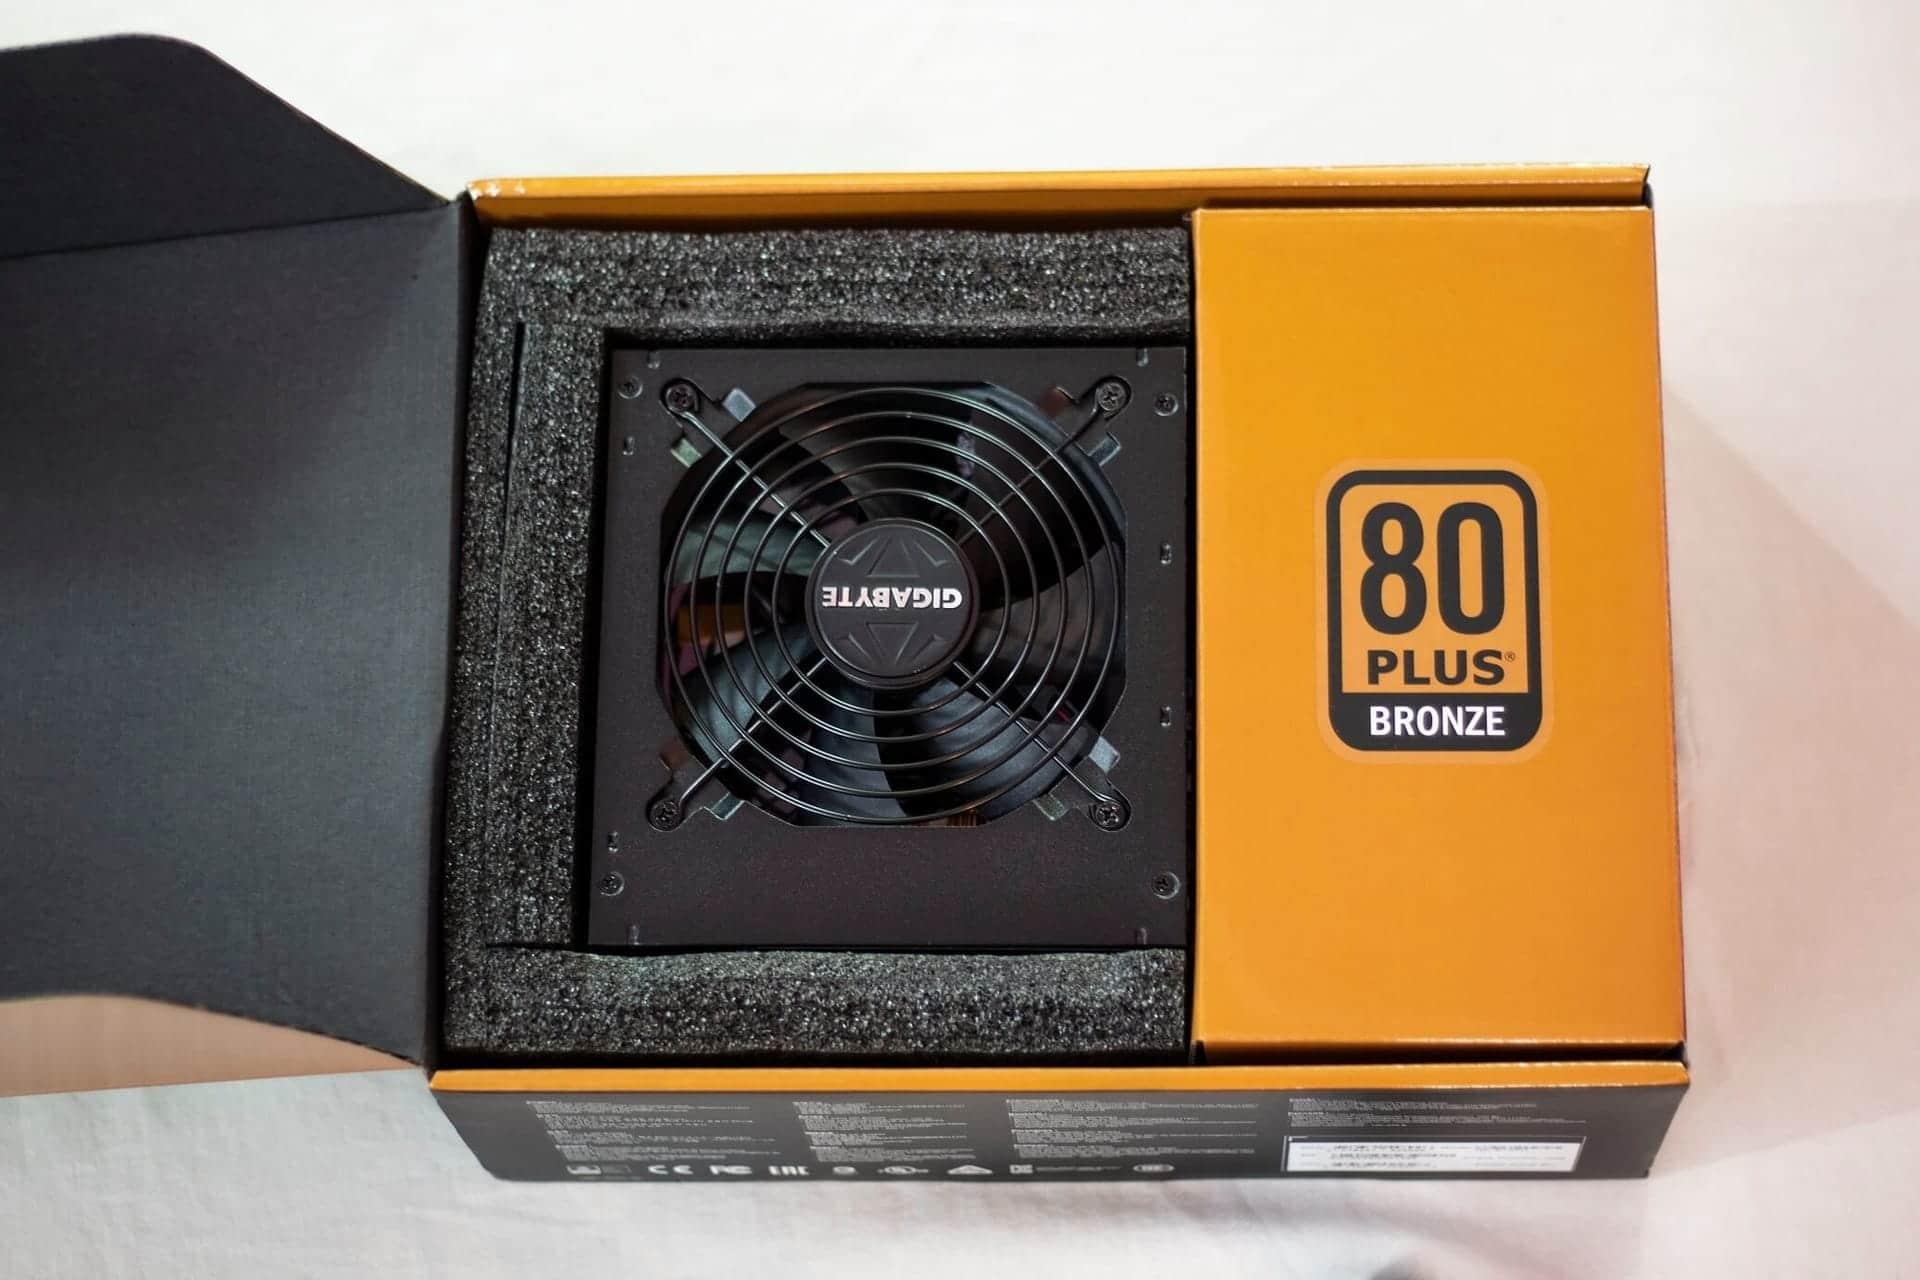 Gigabyte B700H Box Opening